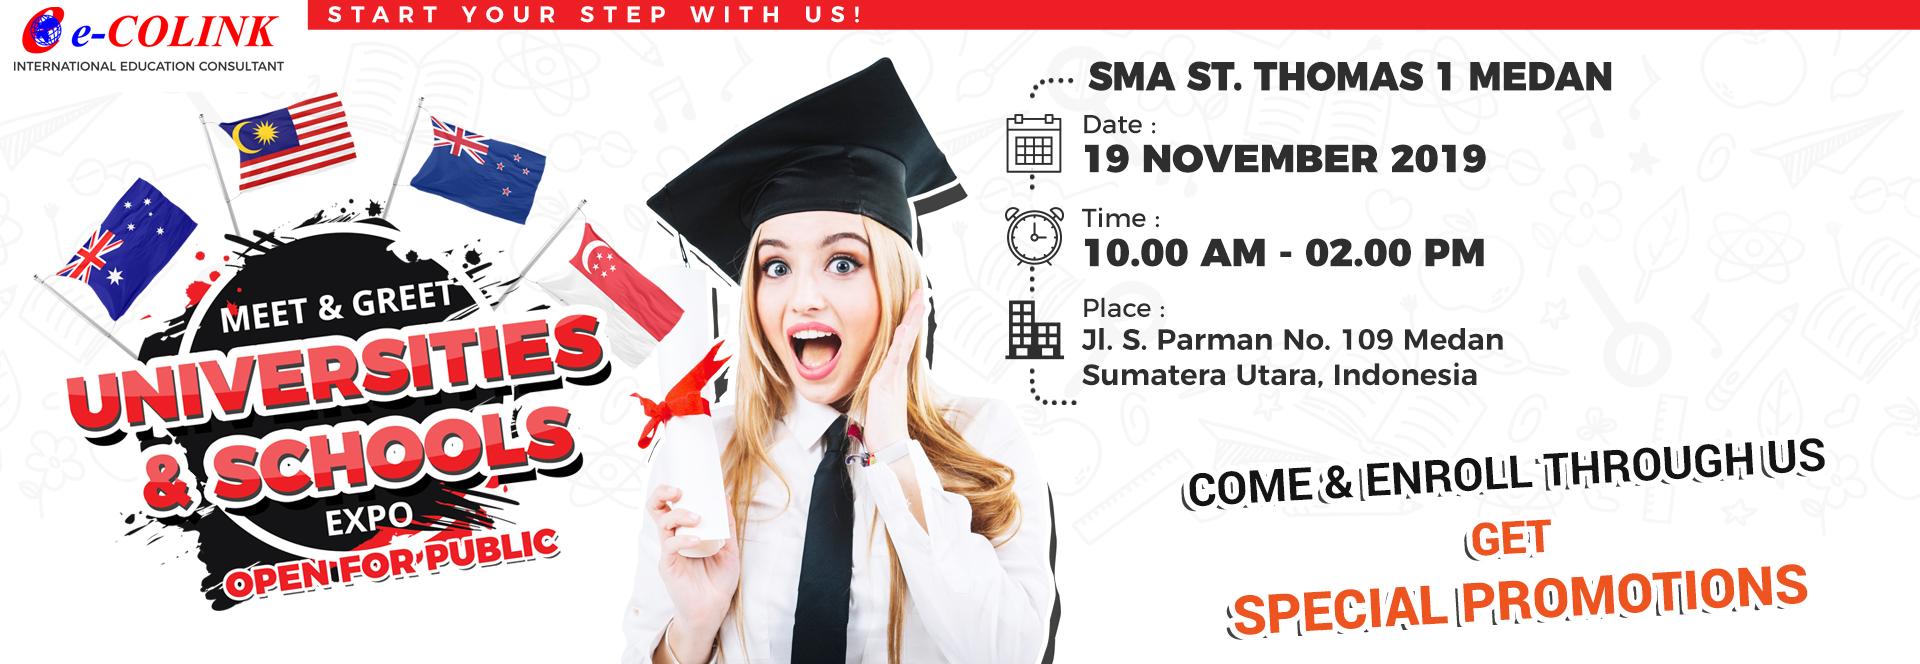 INTERNATIONAL EDUCATION EXPO 2019 - MEDAN - SMA ST. THOMAS 1 MEDAN